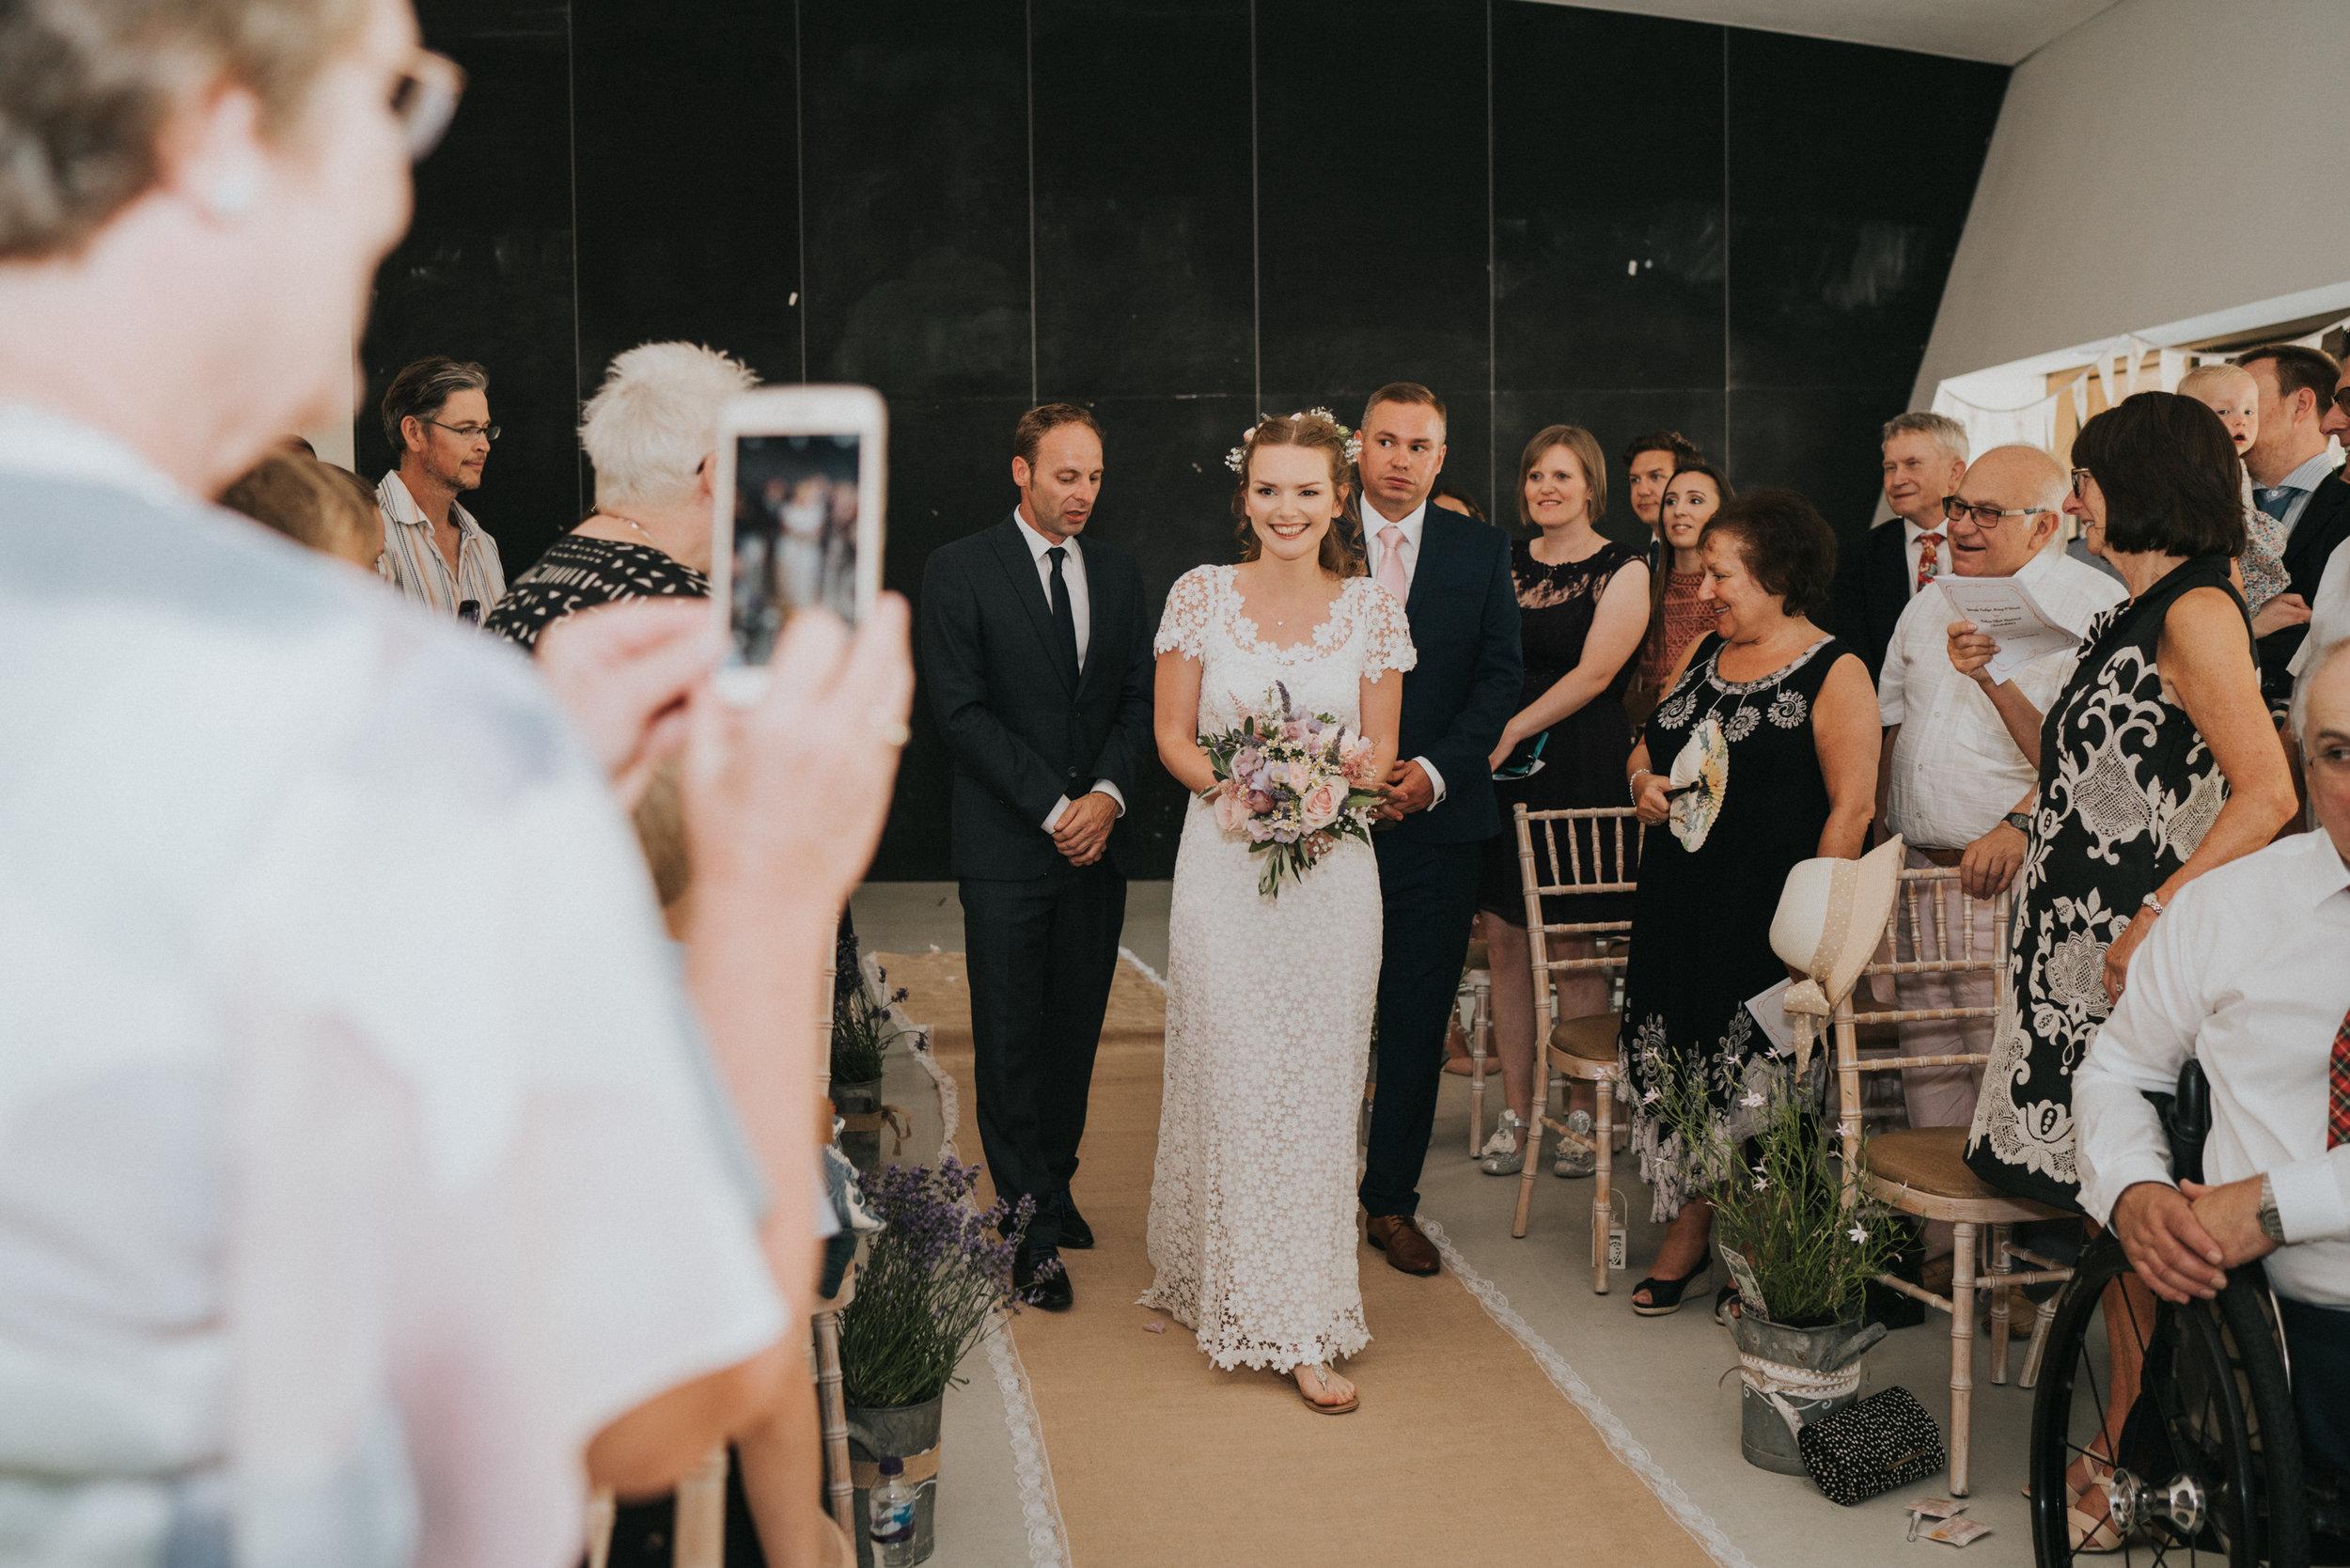 Grace-Elizabeth-Georgie-Amalaketu-Firstsite-Colchester-Essex-Boho-Buddhist-Wedding-Alternative-Wedding-Photography-Essex (40 of 100).jpg